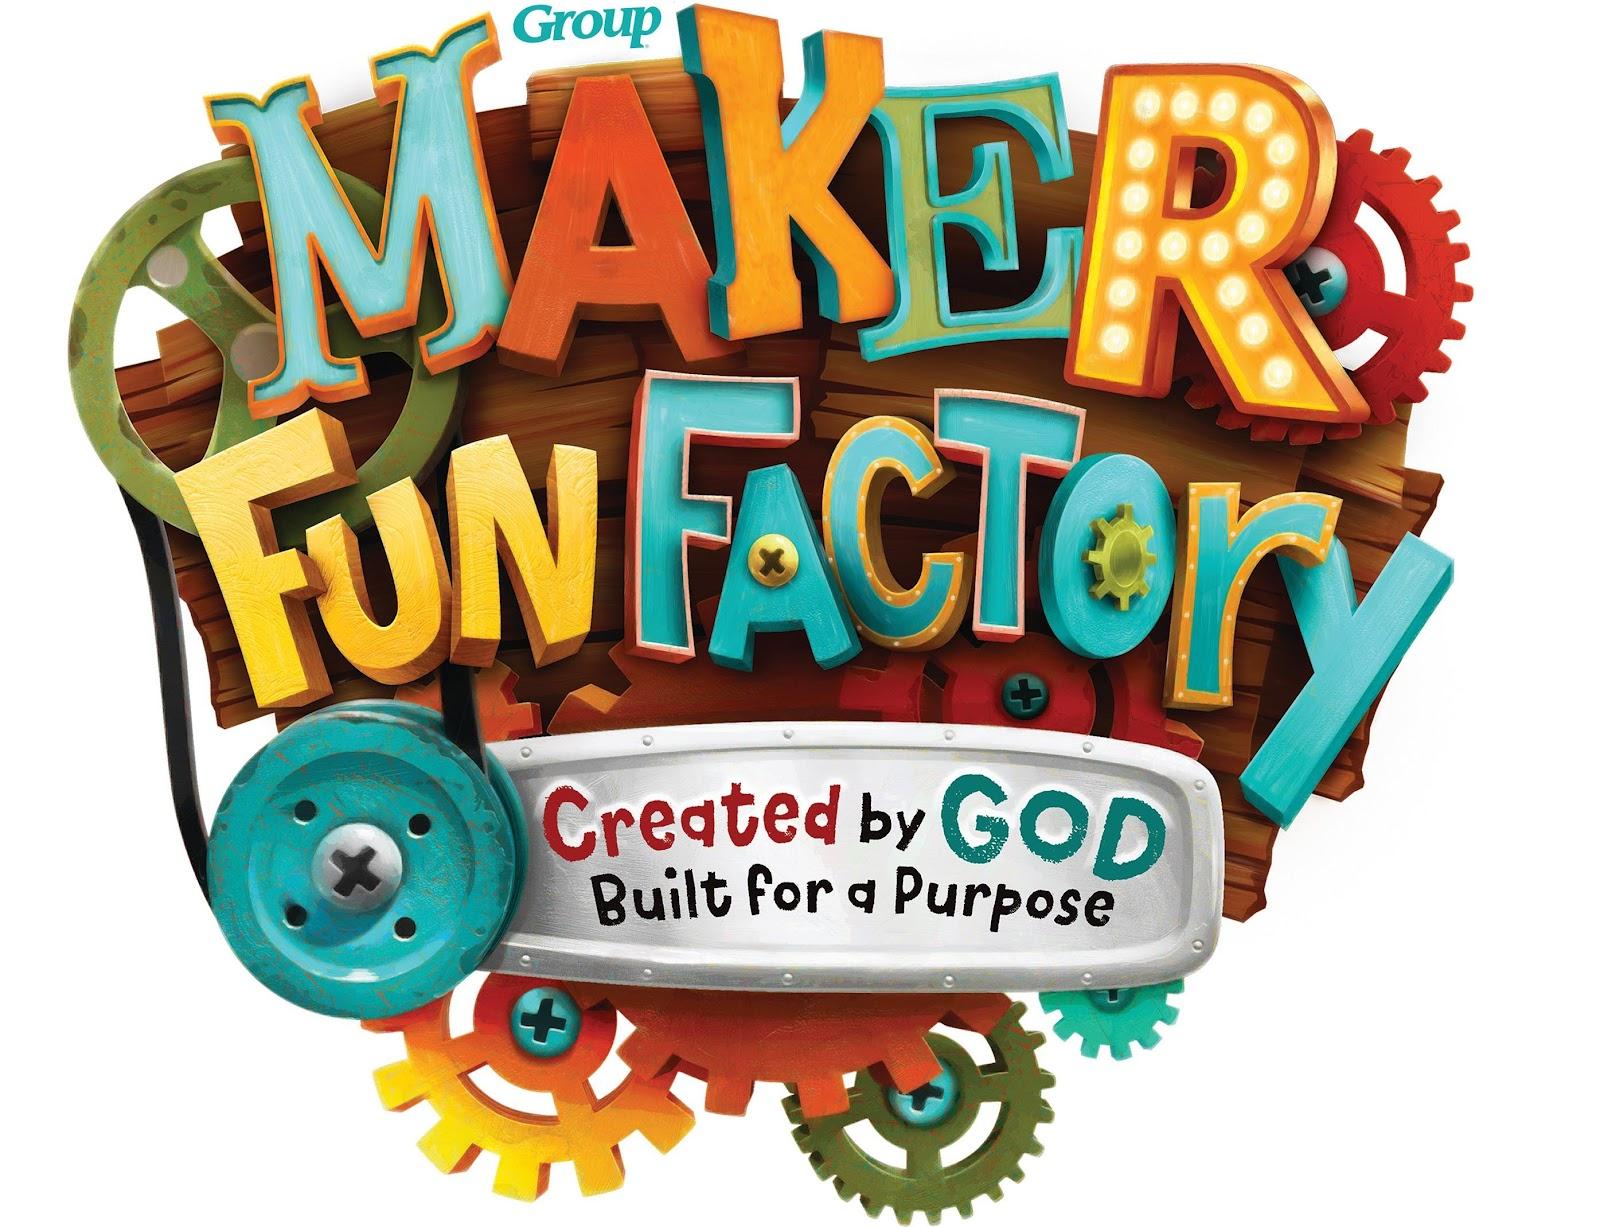 C:\Users\Kathy\AppData\Local\Temp\Temp1_maker-fun-factory-vbs-logo-pack.zip\maker-fun-factory-logo-pack\maker-fun-factory-vbs-logo-HiRes-CMYK.jpg